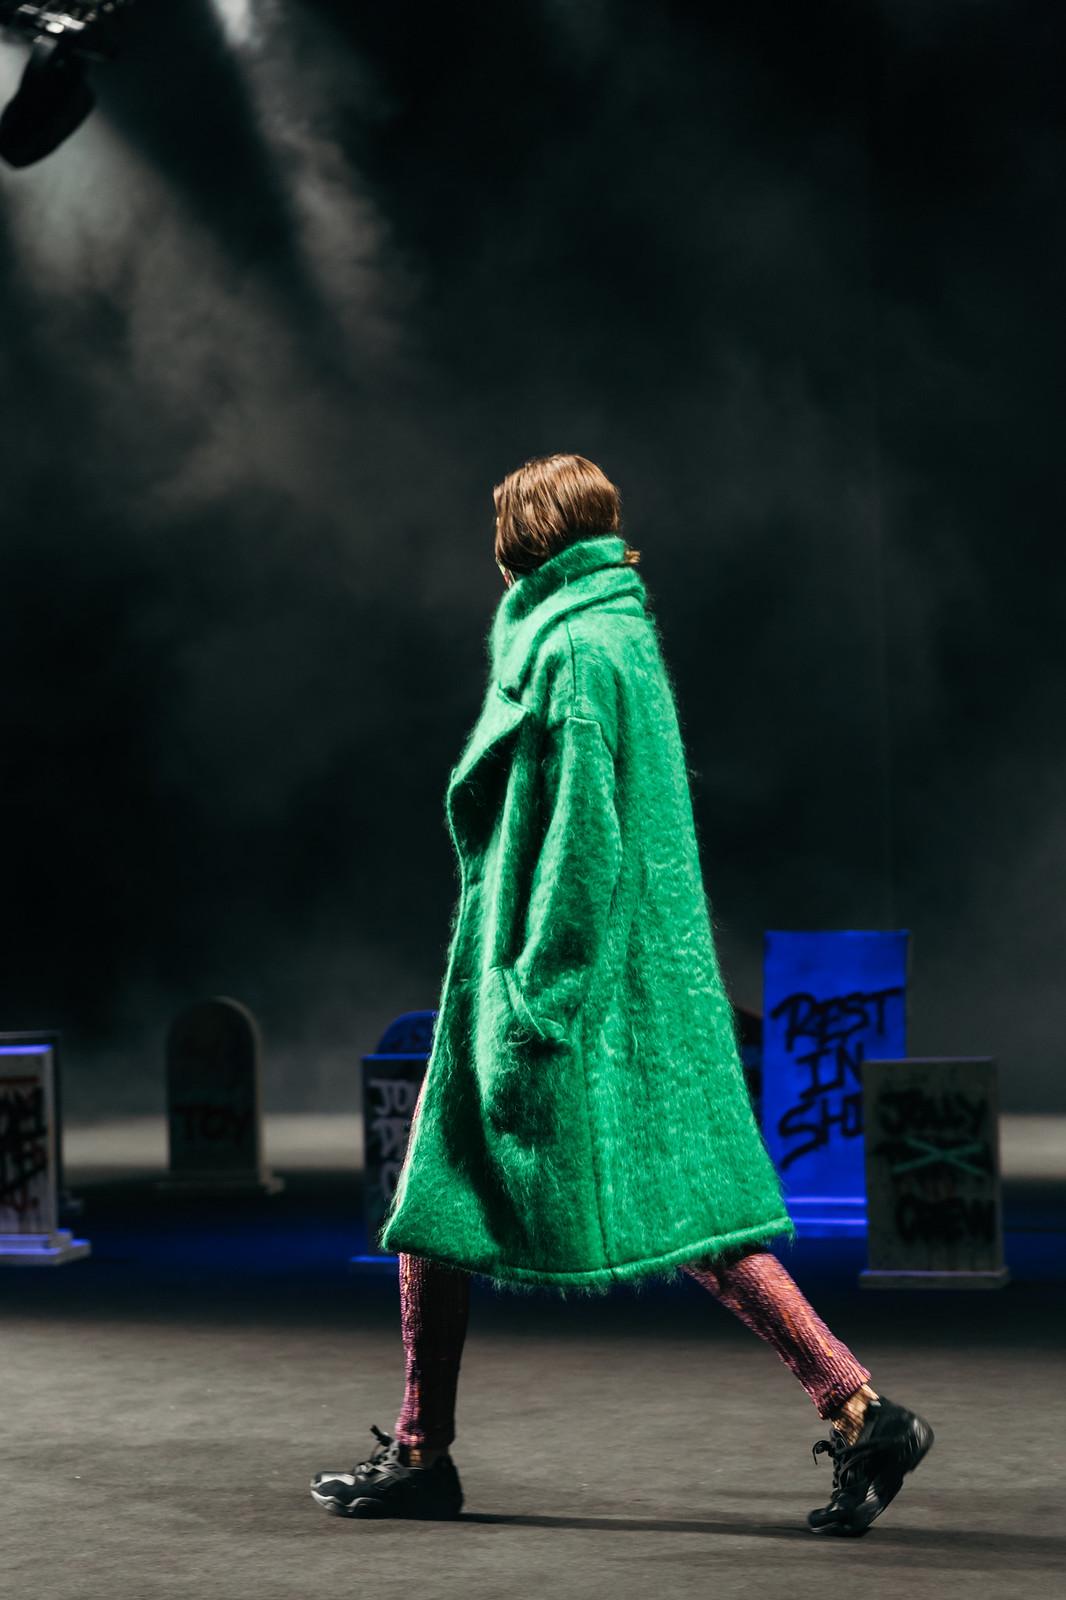 Jessie Chanes - Seams for a desire - 080 Bacelona Fashion #080bcnfasion -55